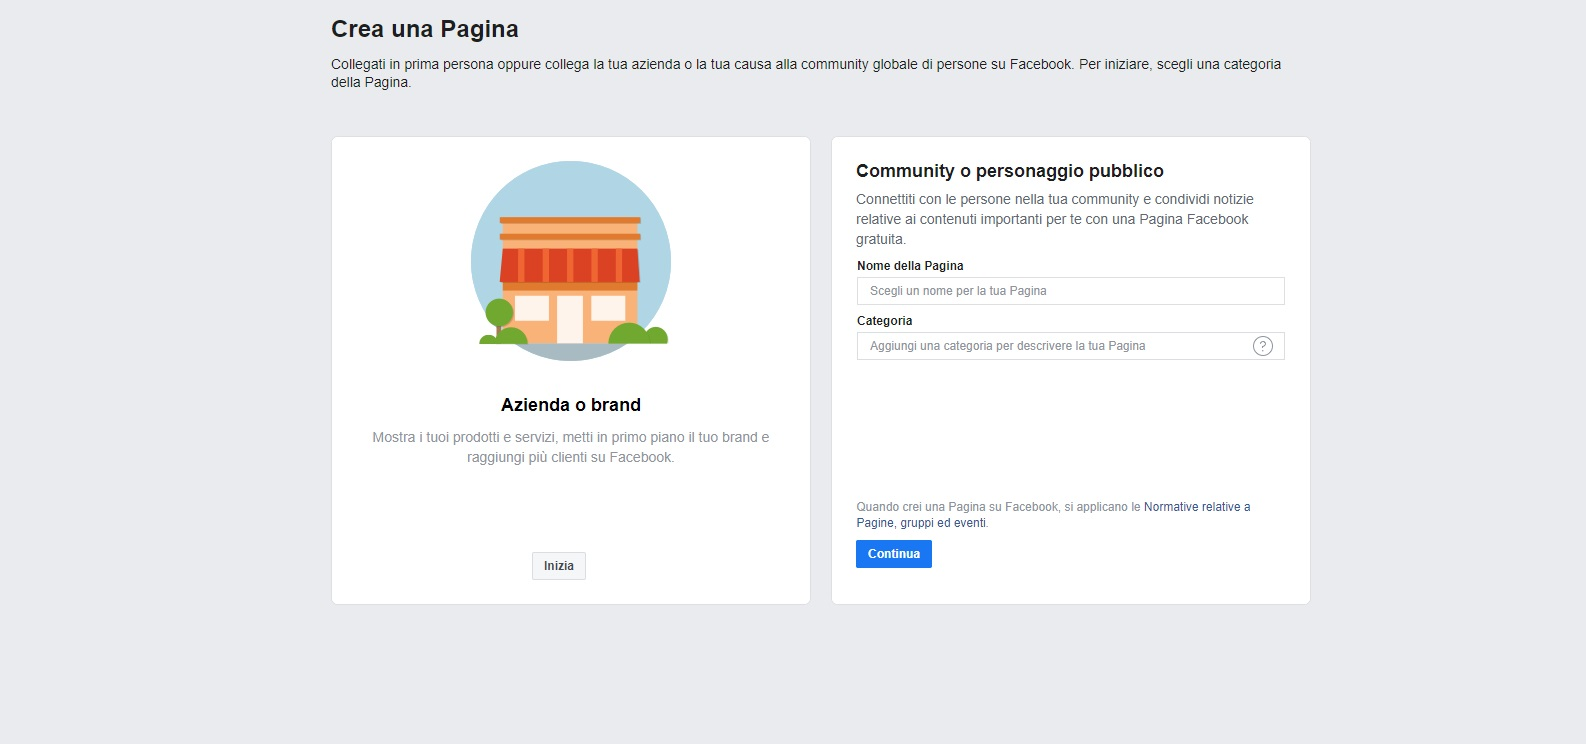 Creare una pagina